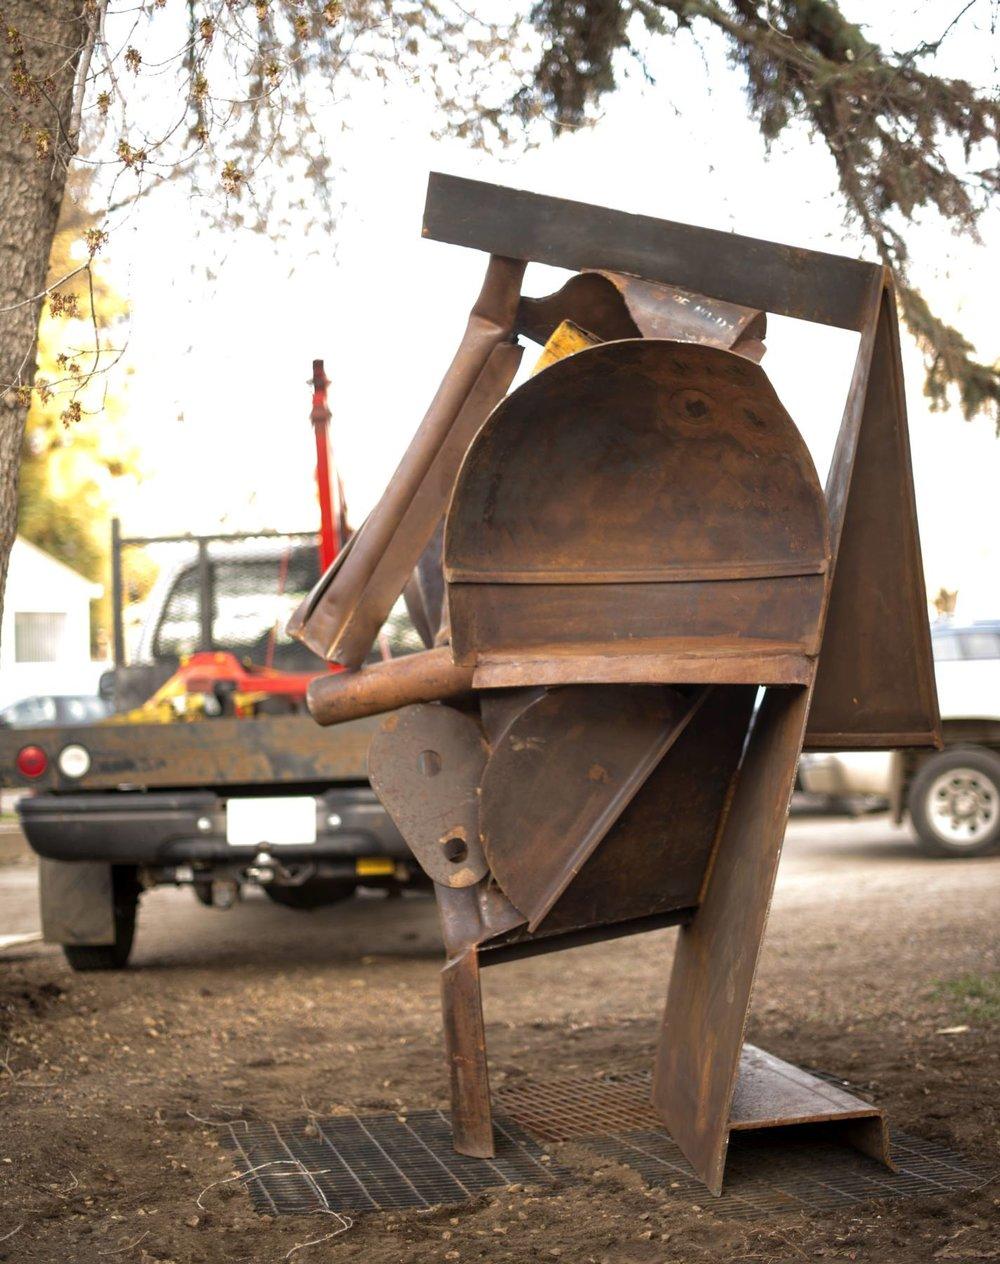 Hellmund Studio - Andrew C. Hellmund   Sculptor + Educator